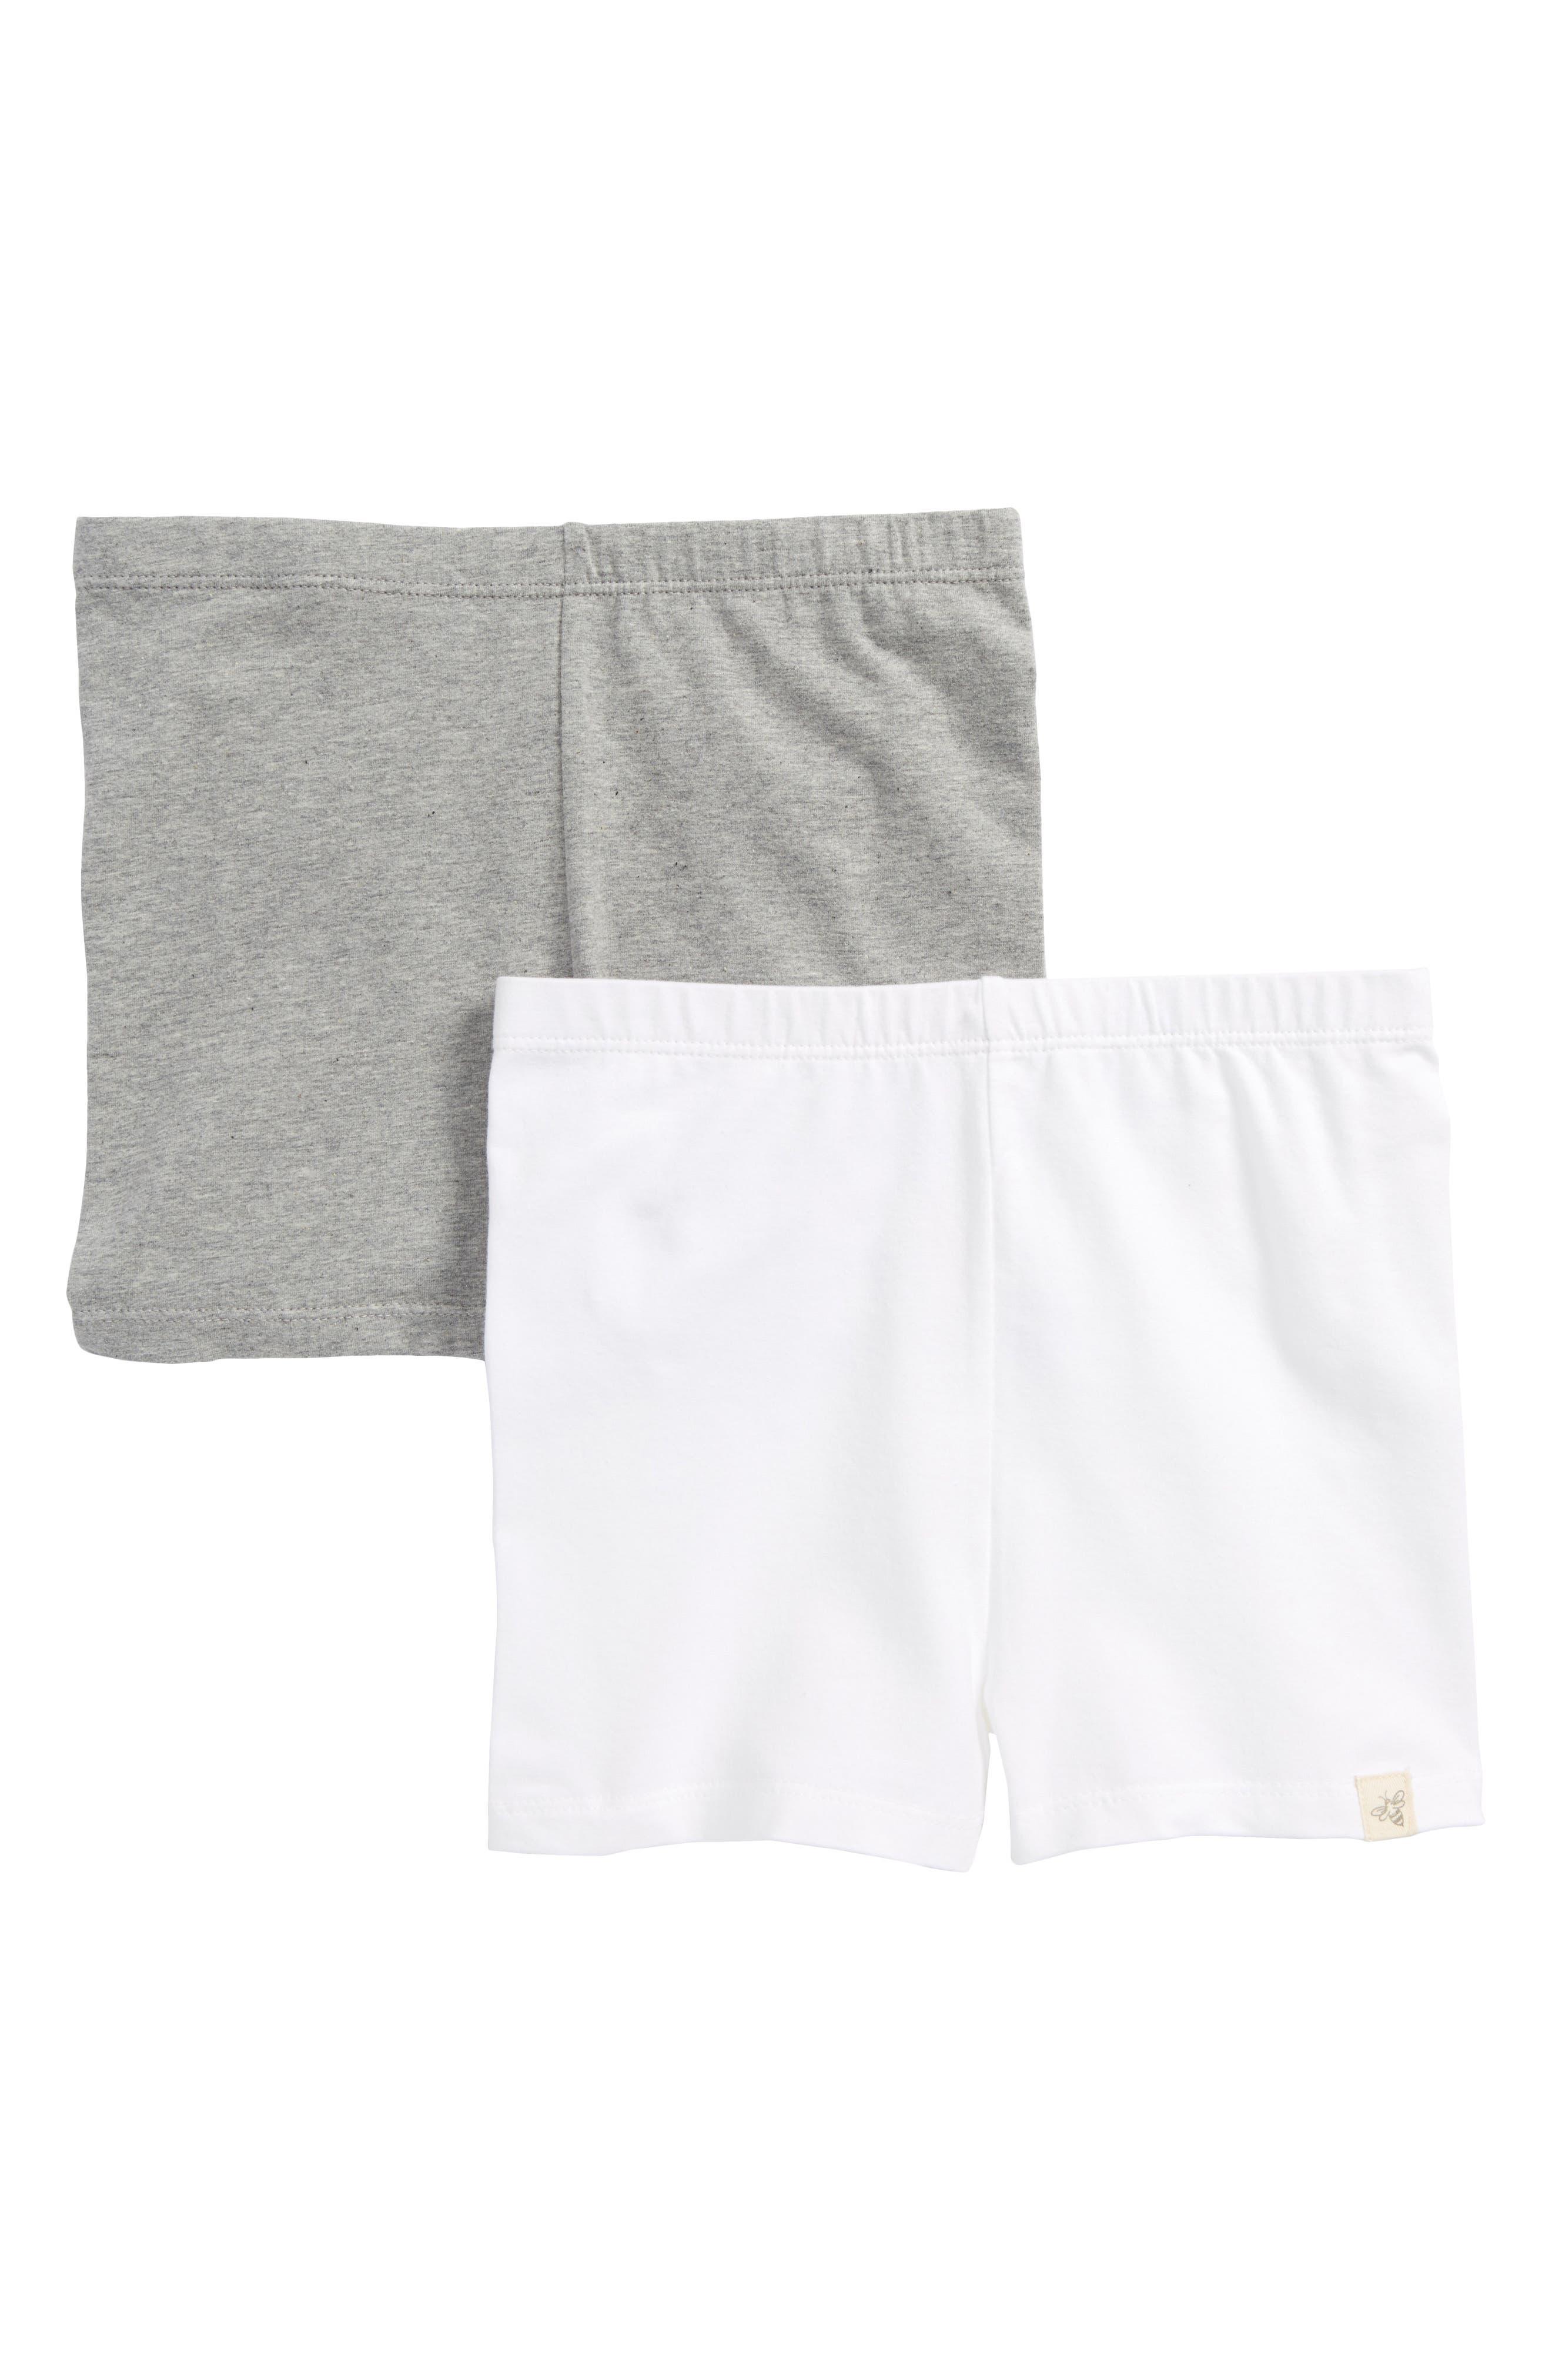 2-Pack Organic Cotton Blend Bike Shorts,                             Main thumbnail 1, color,                             020